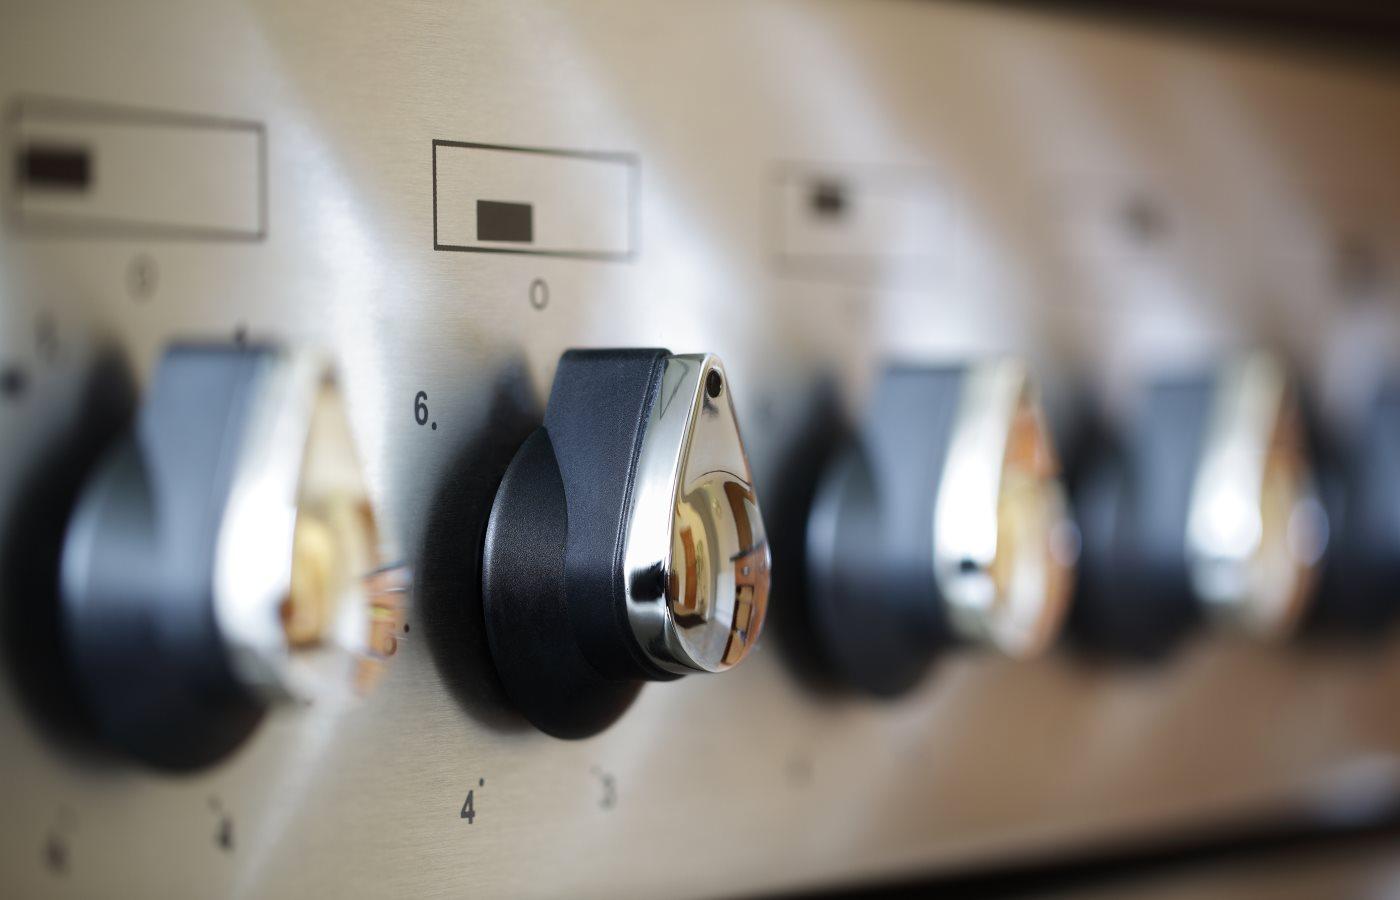 Commercial kitchen stove temperature controls